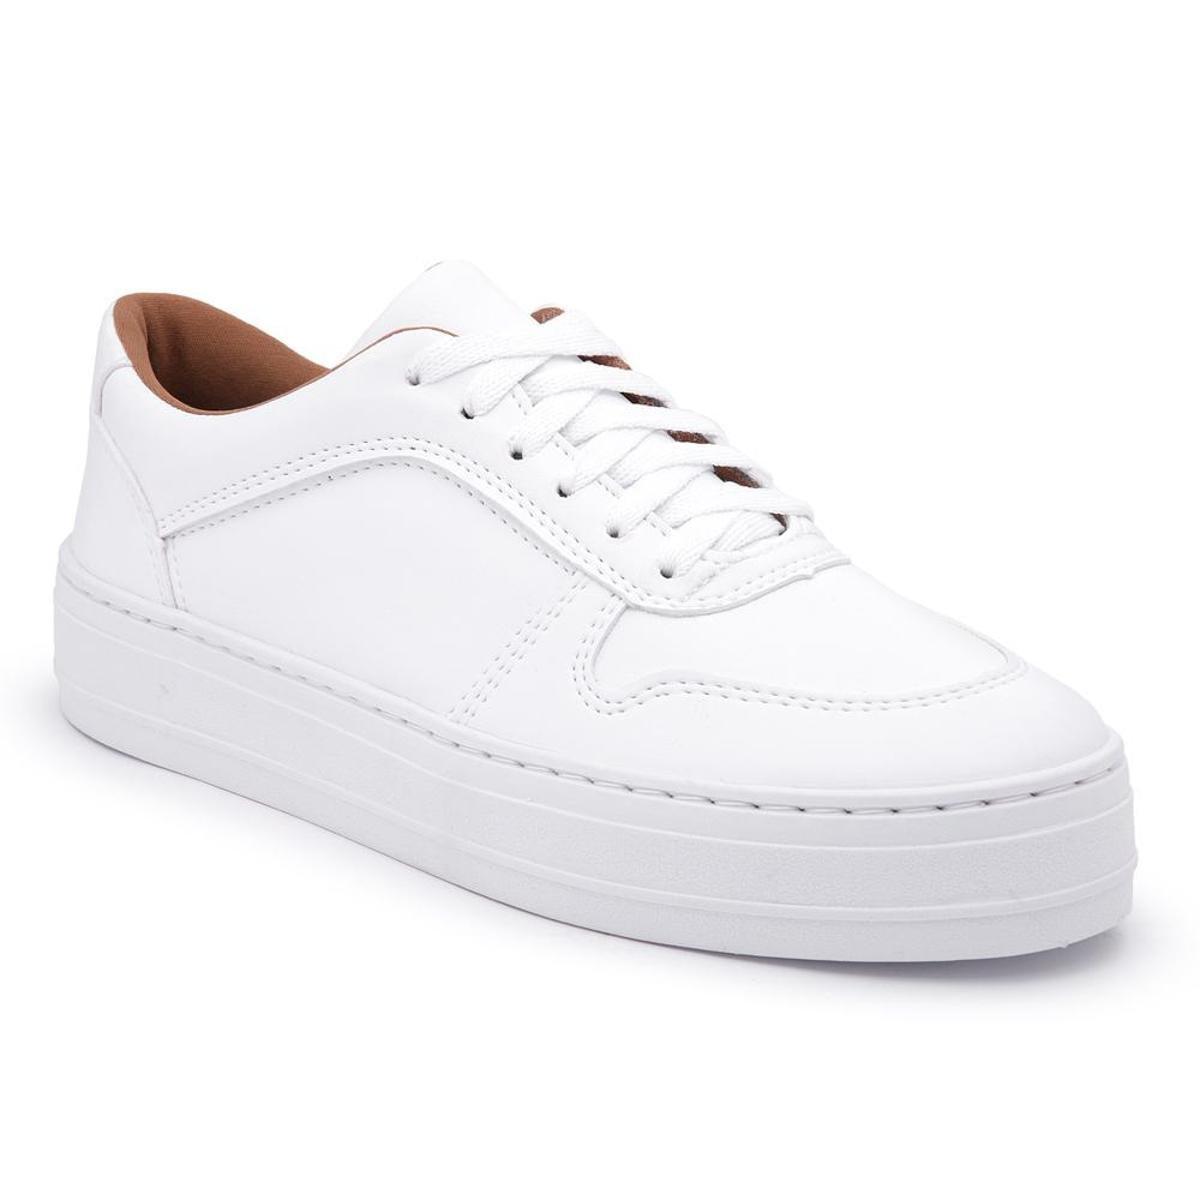 Tênis Sapatênis Confort Casual Tenehi Feminino 080 - Branco - Compre ... d8b6c57fe057f